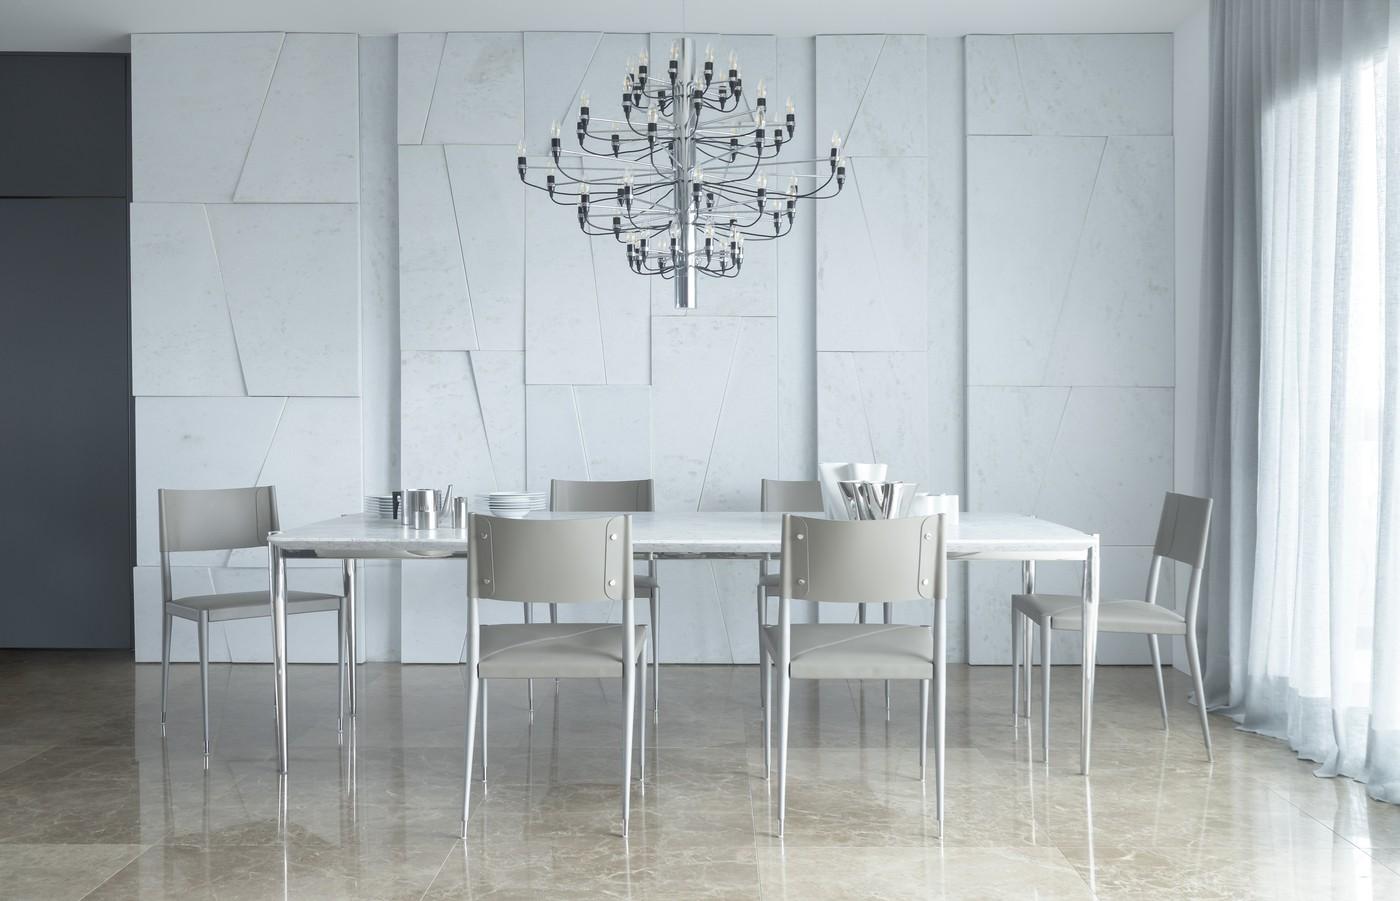 Décor do dia: sala de jantar monocromática e integrada ao living (Foto: Mariana Boro)